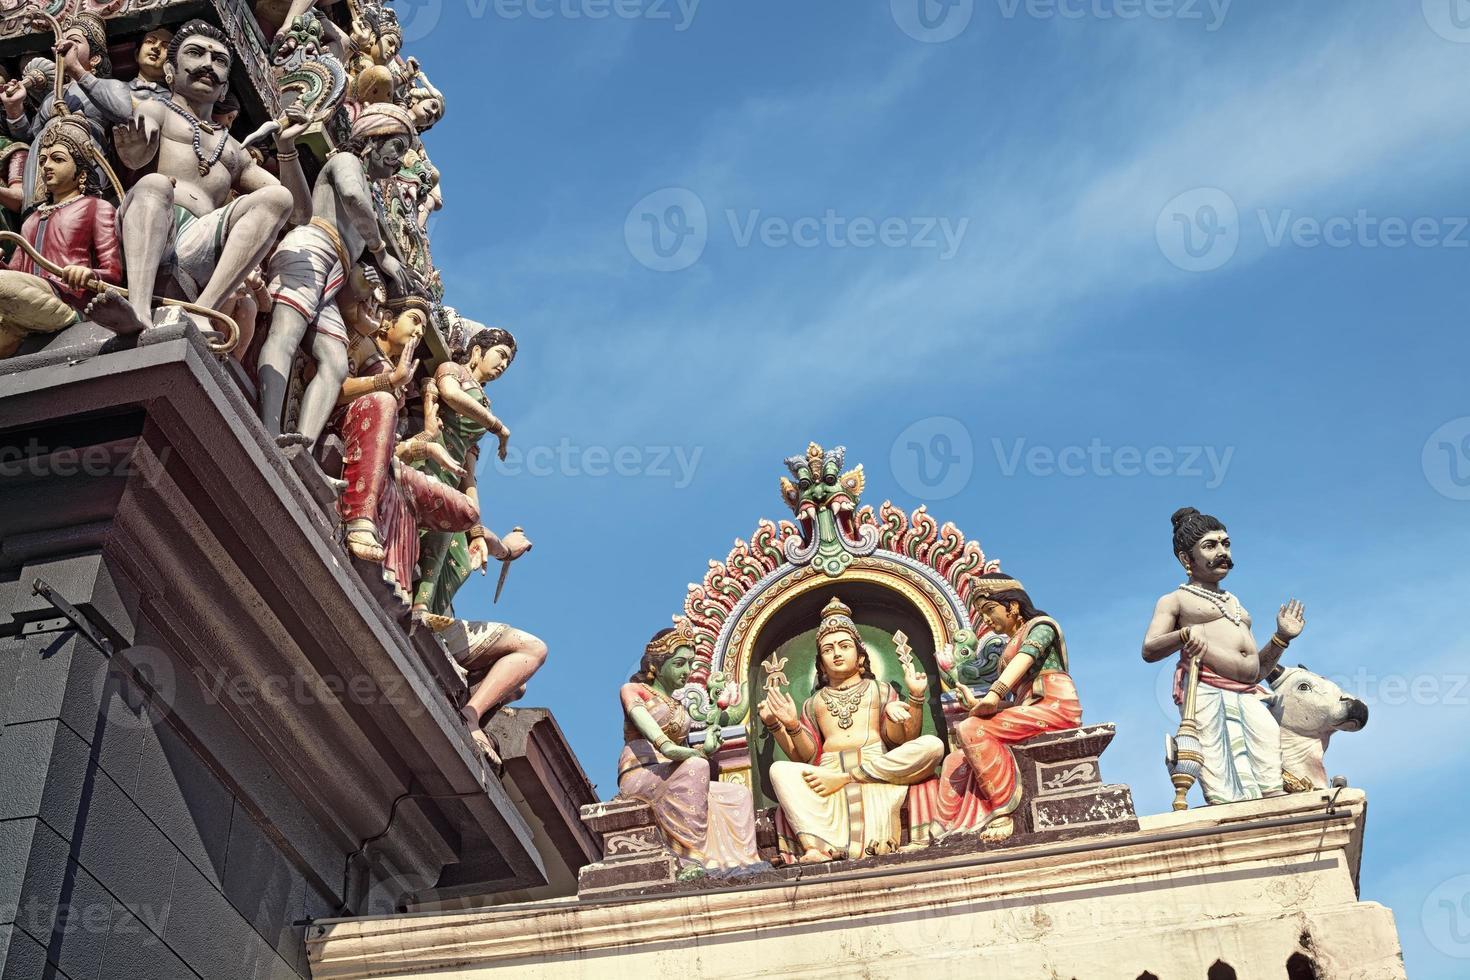 sri mariamman templo hindu em cingapura. foto